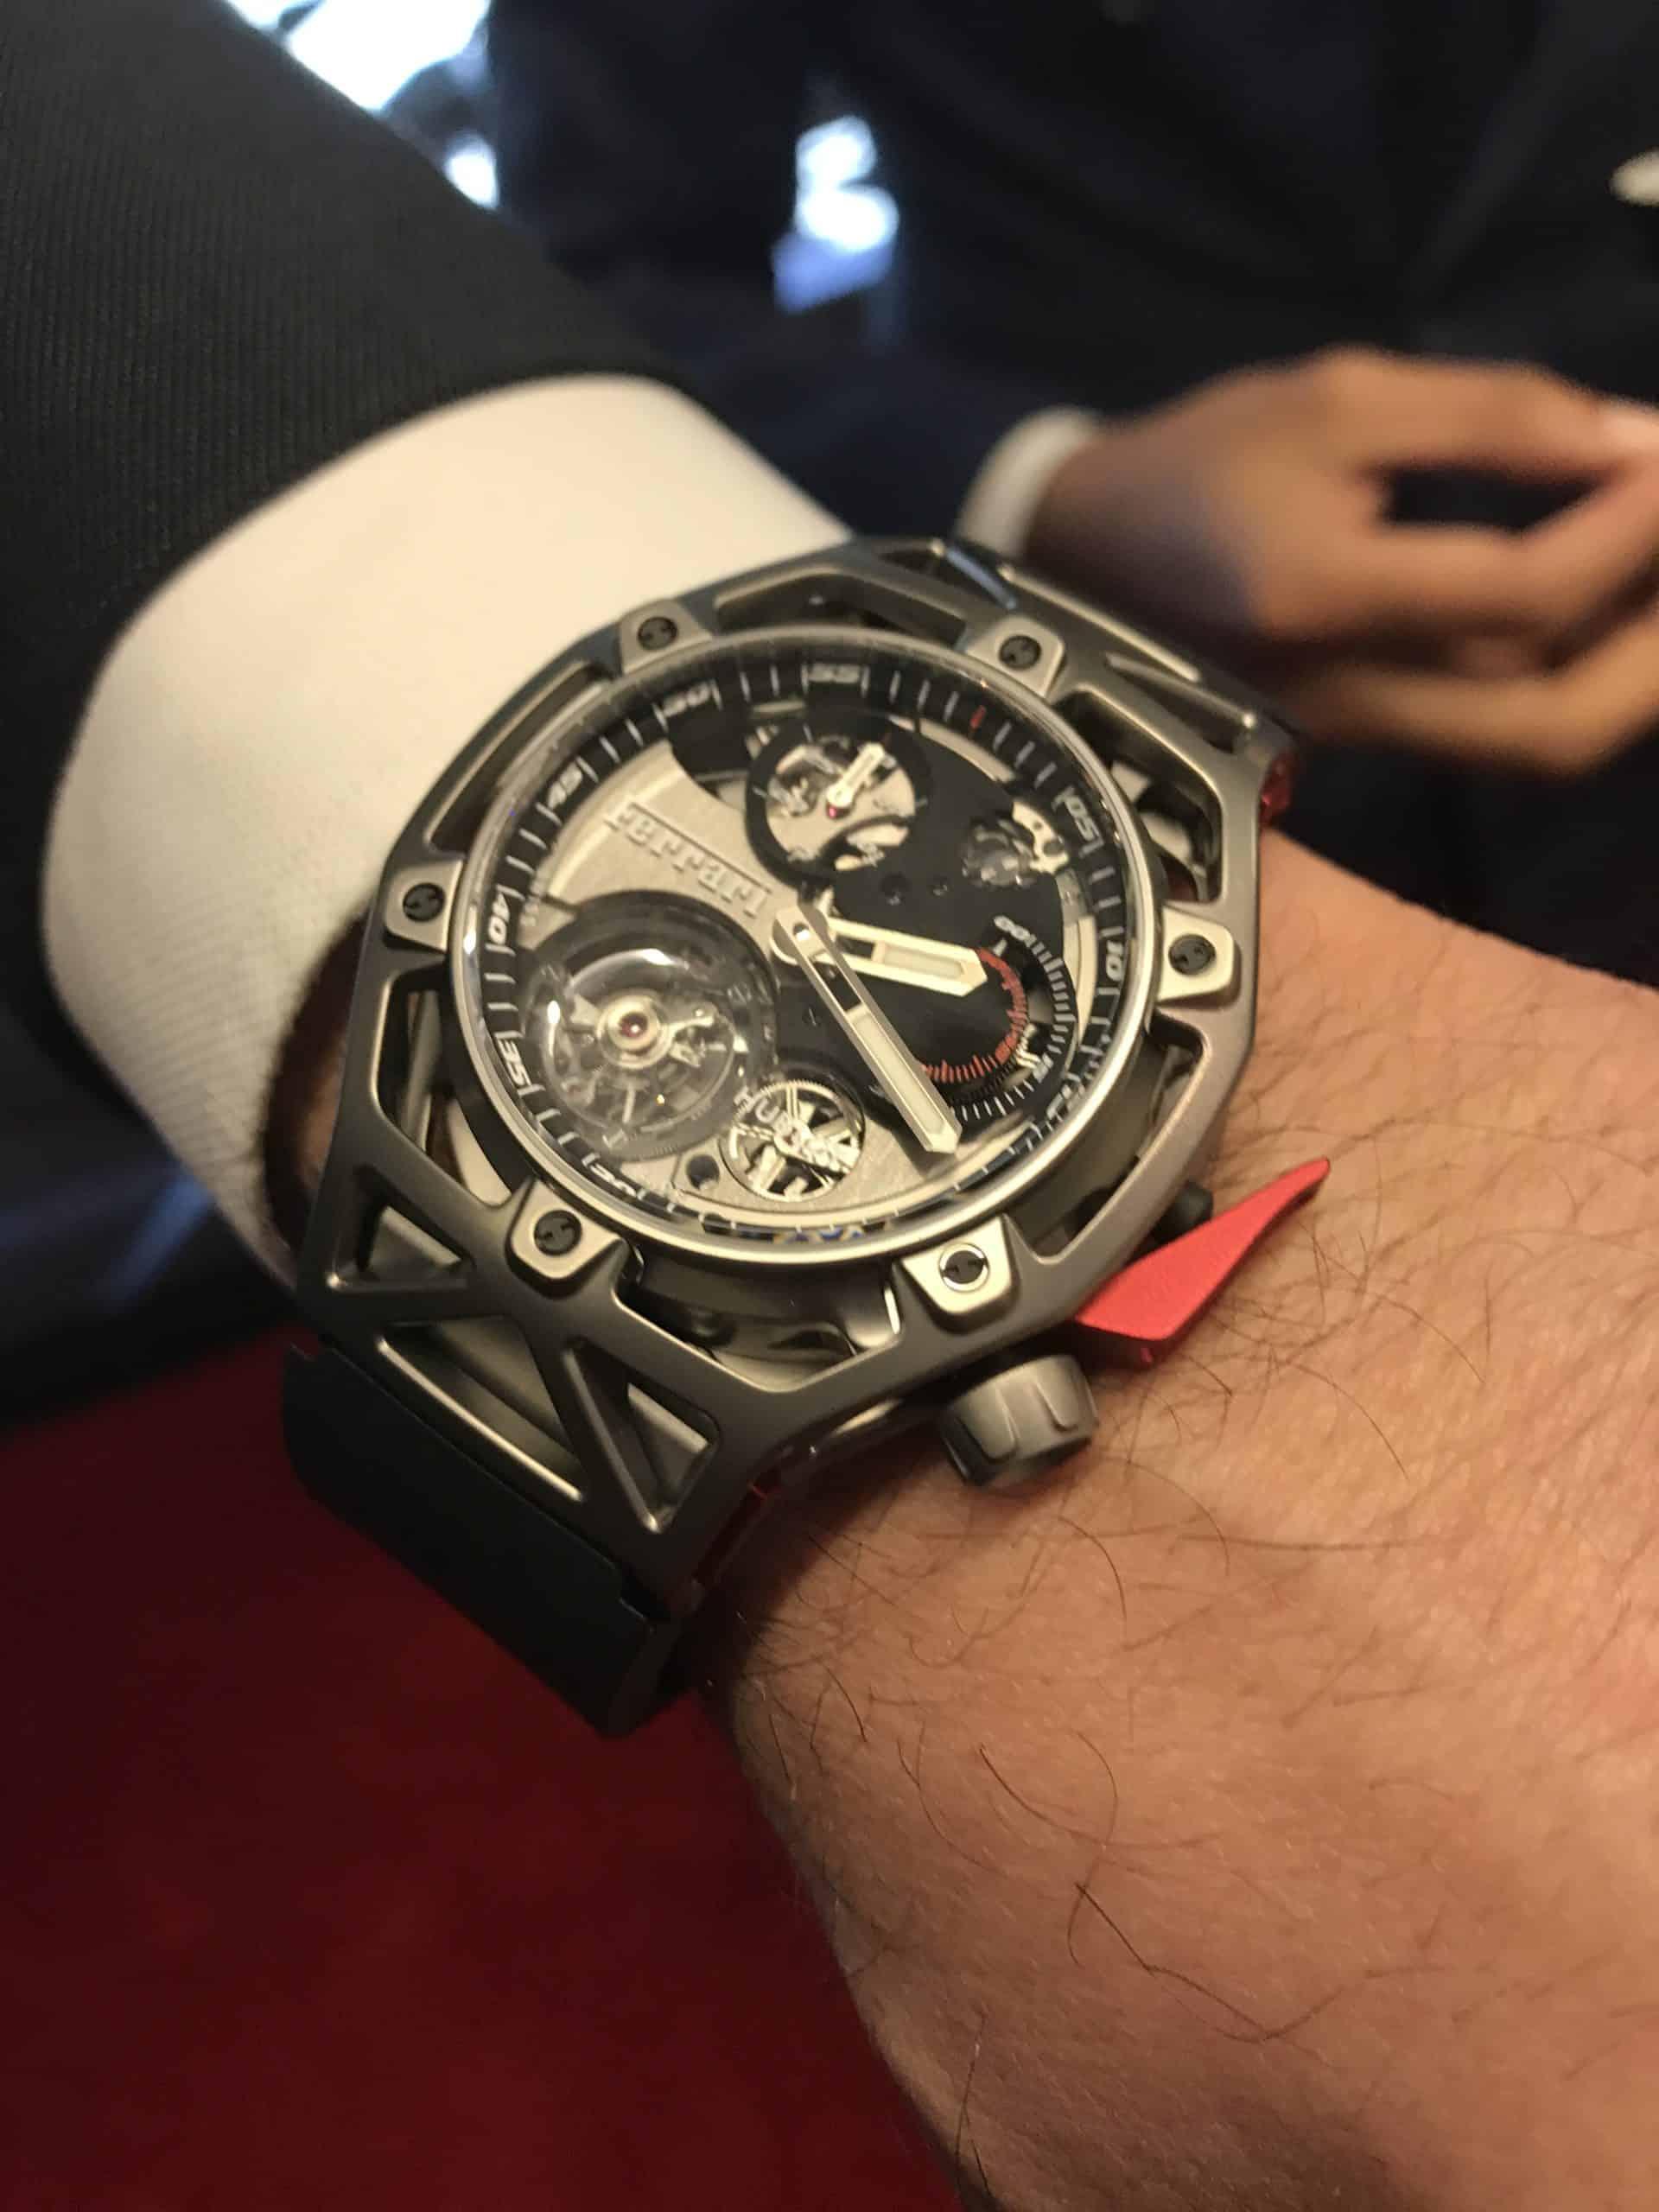 Hublot . Techframe Ferrari 70 years Tourbillon Chronograph - 2017